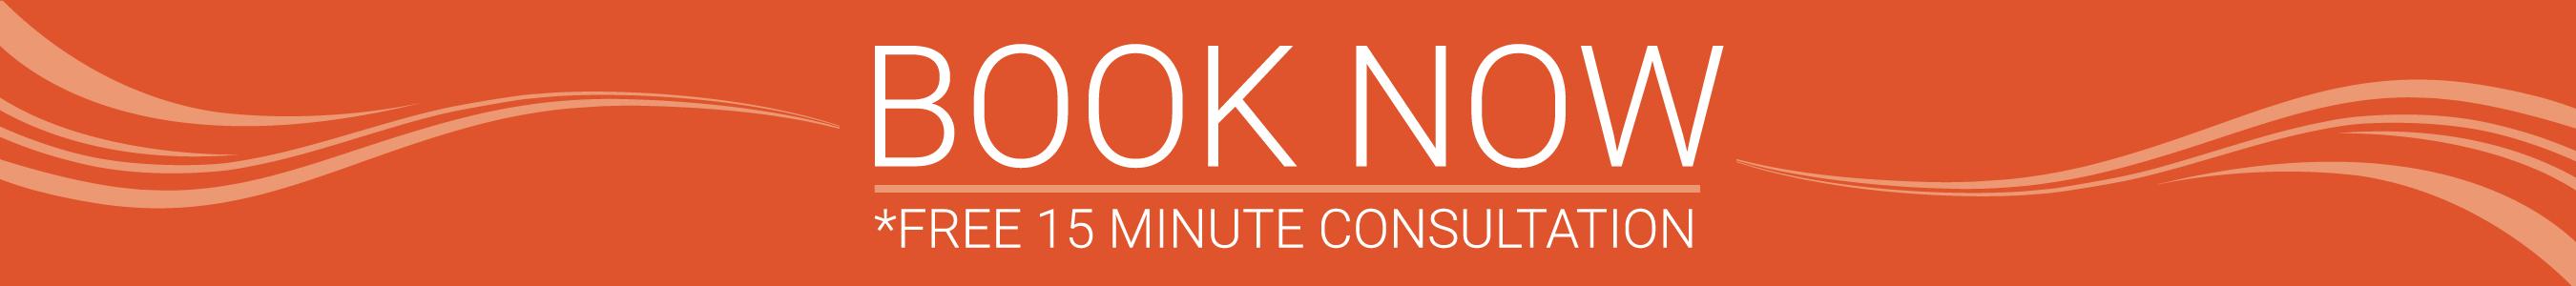 JW-Massage-Pembrokeshire-Book-NowJW-Massage-Pembrokeshire-Book-Now